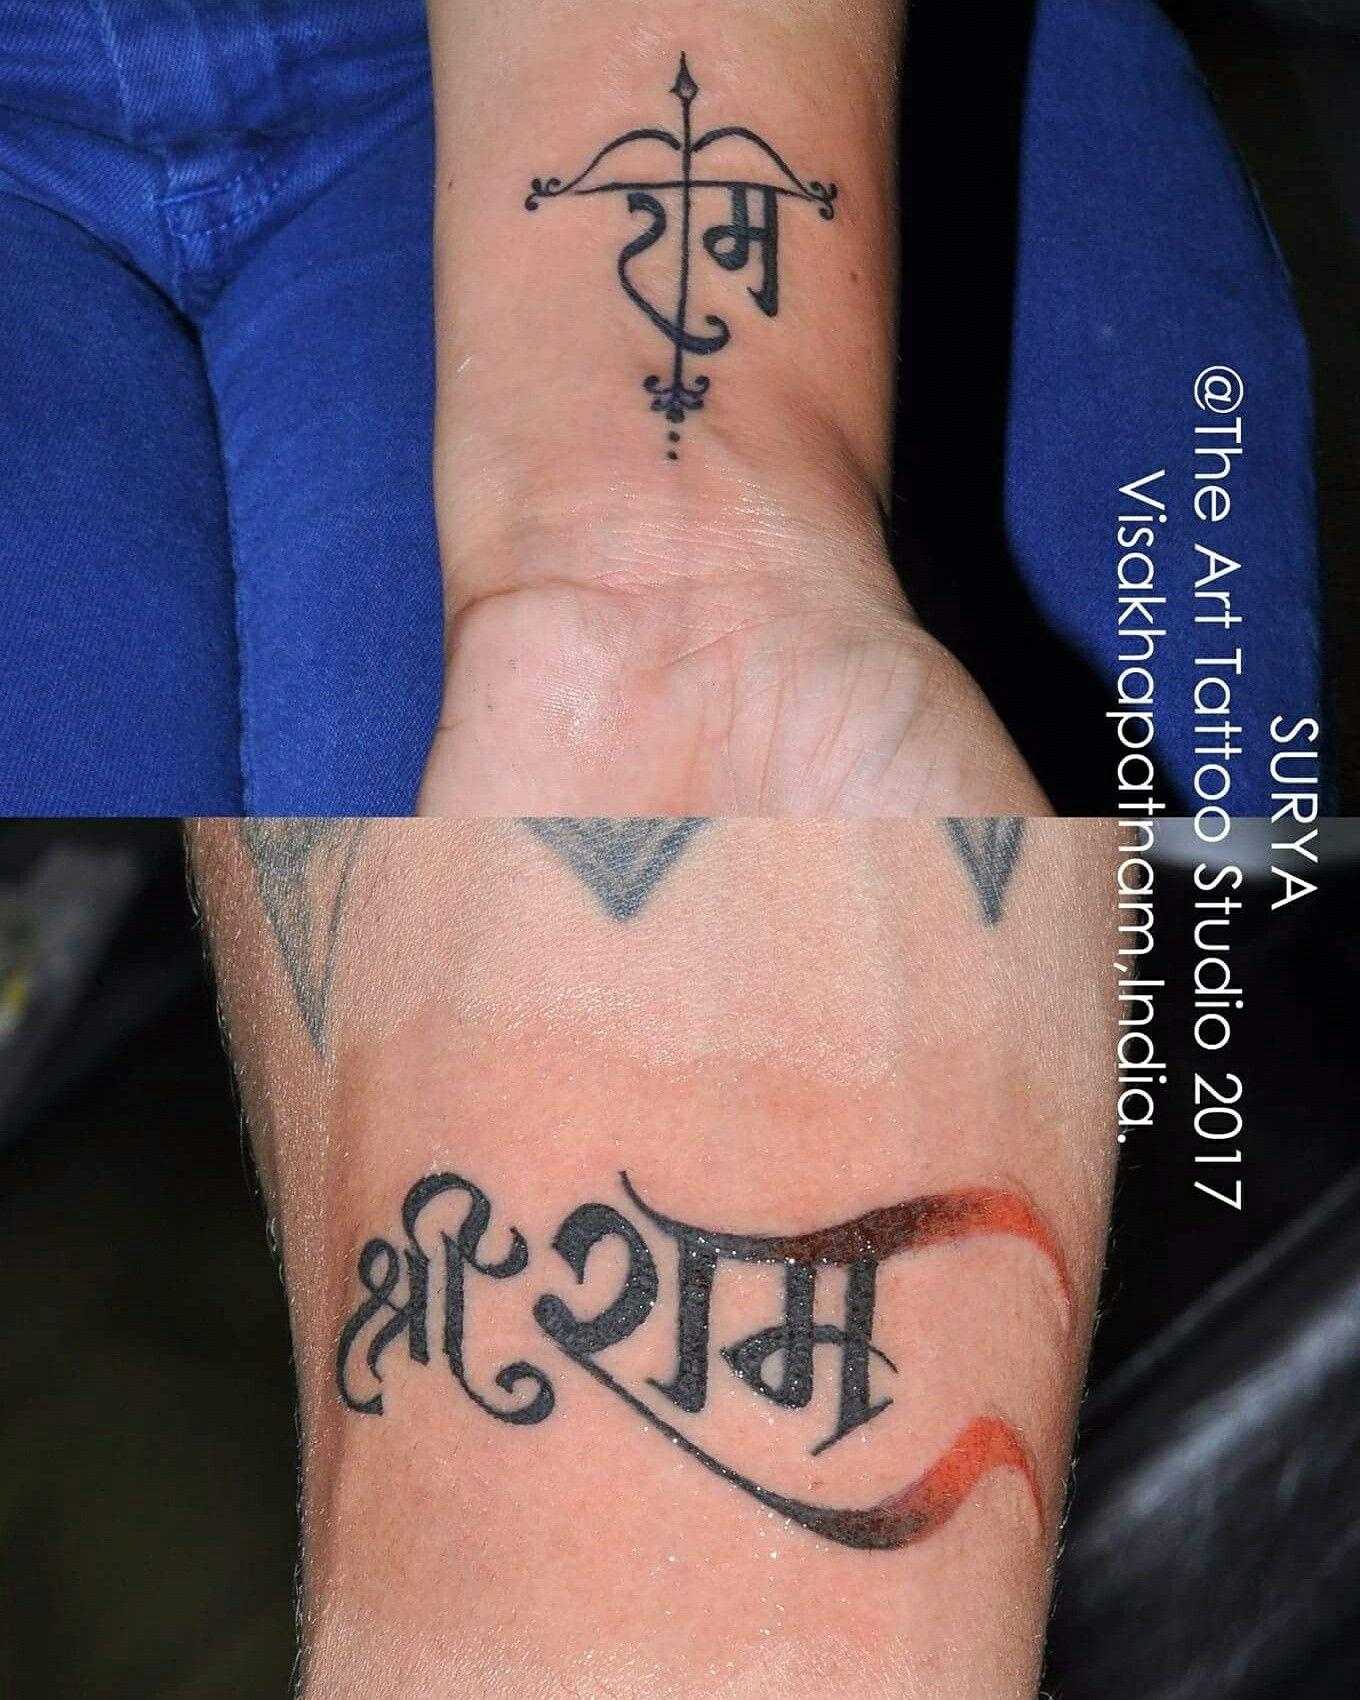 Hindi Calligraphy Jai Sri Ram Ram Tattoo Strength Tattoo Name Tattoo Designs